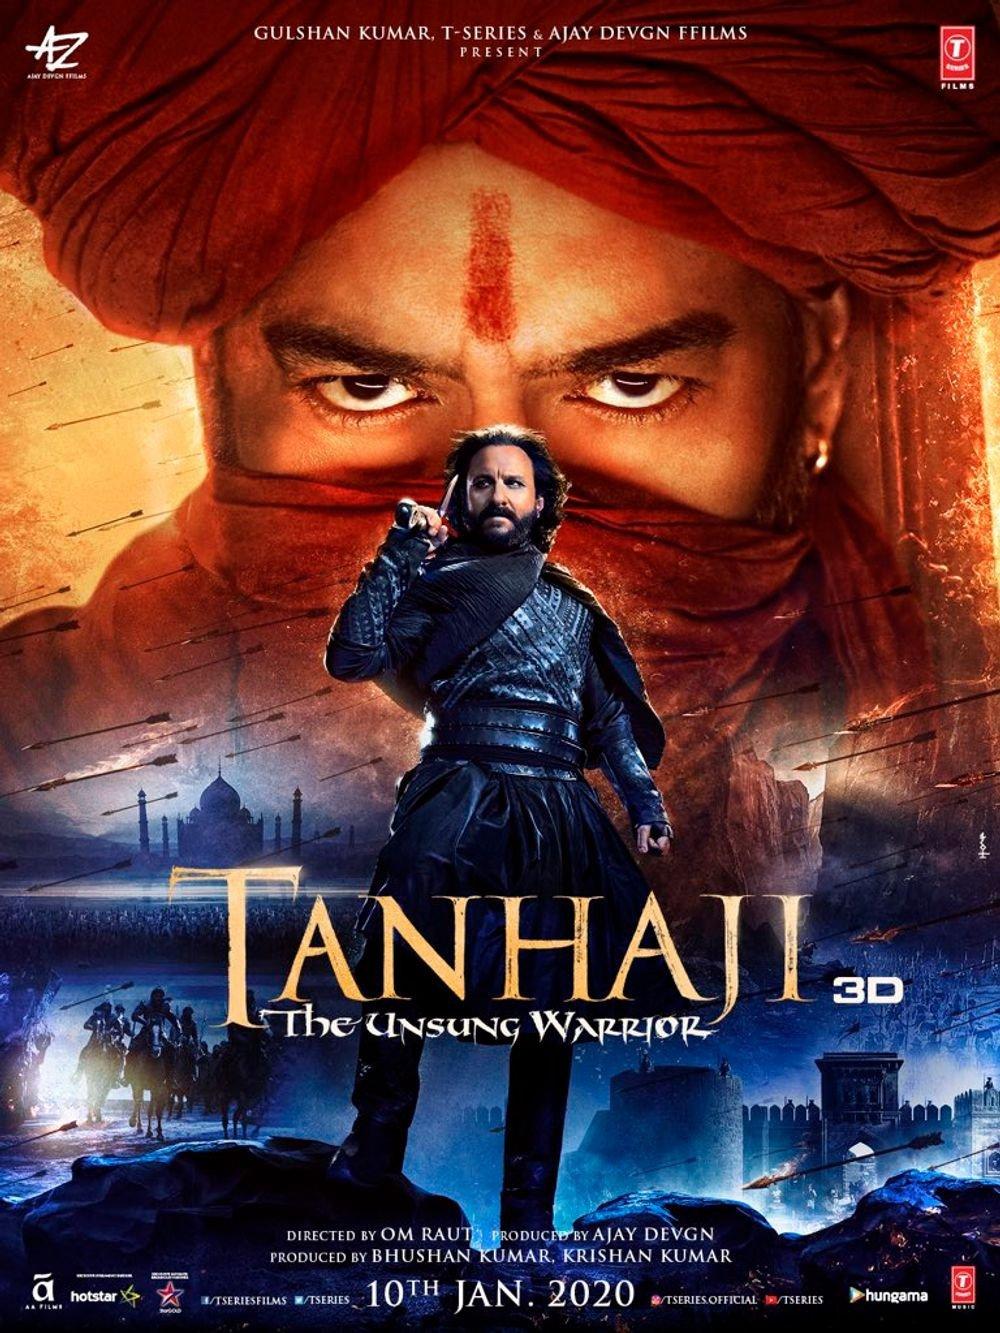 <p>Tanhaji The Unsung Warrior</p>-banner